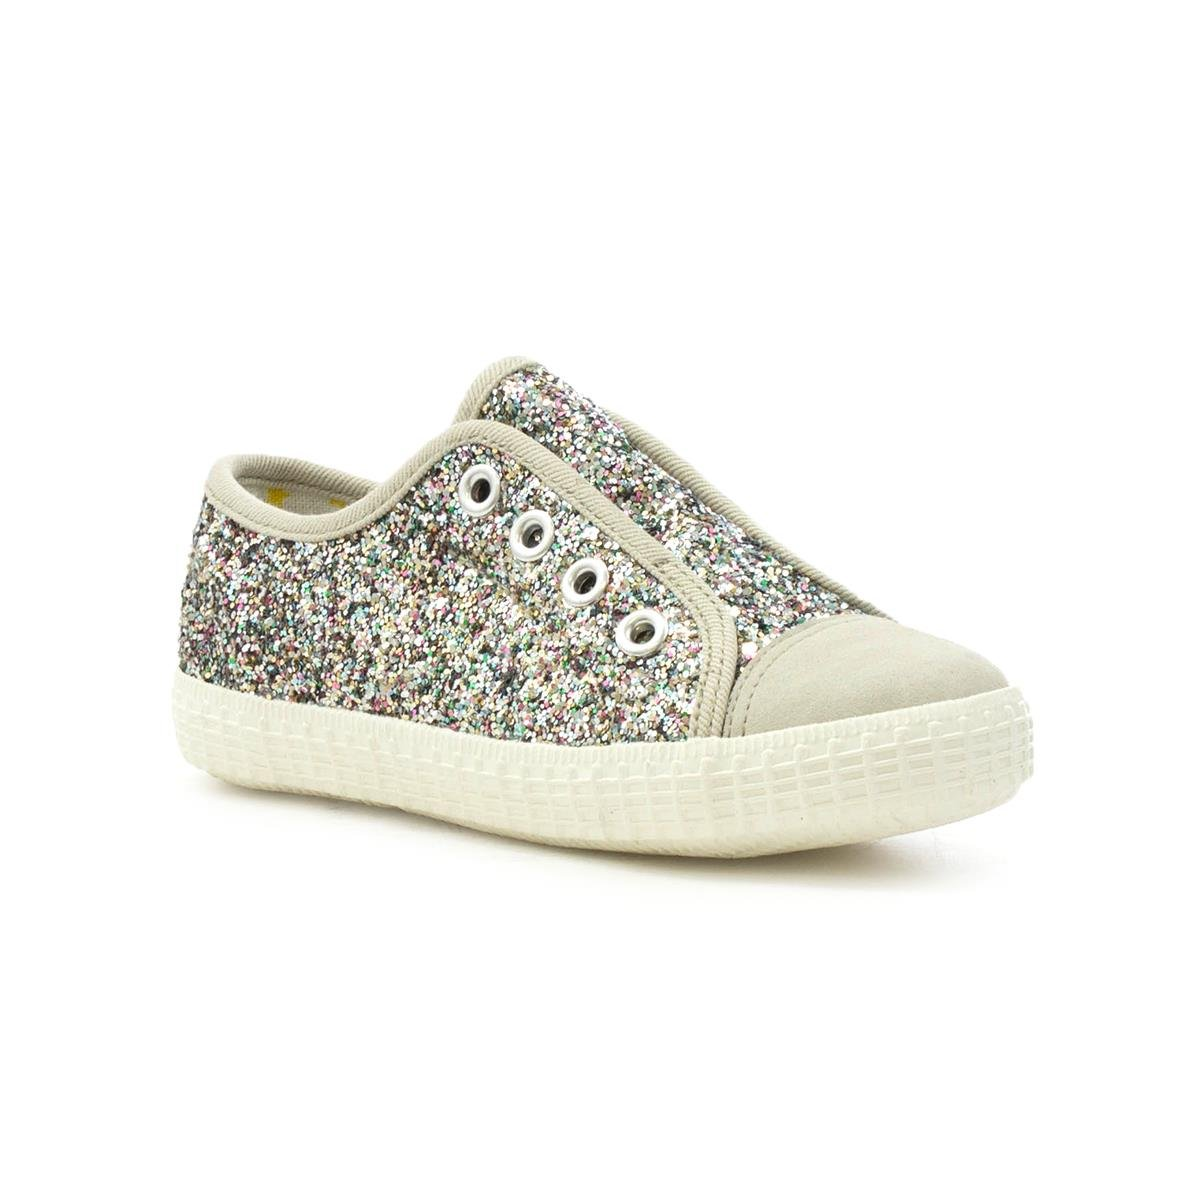 5f6daf2f7a93 Walkright Kids Multi Glitter Slip On Canvas - Size 2 UK - Multicolour   Amazon.co.uk  Shoes   Bags